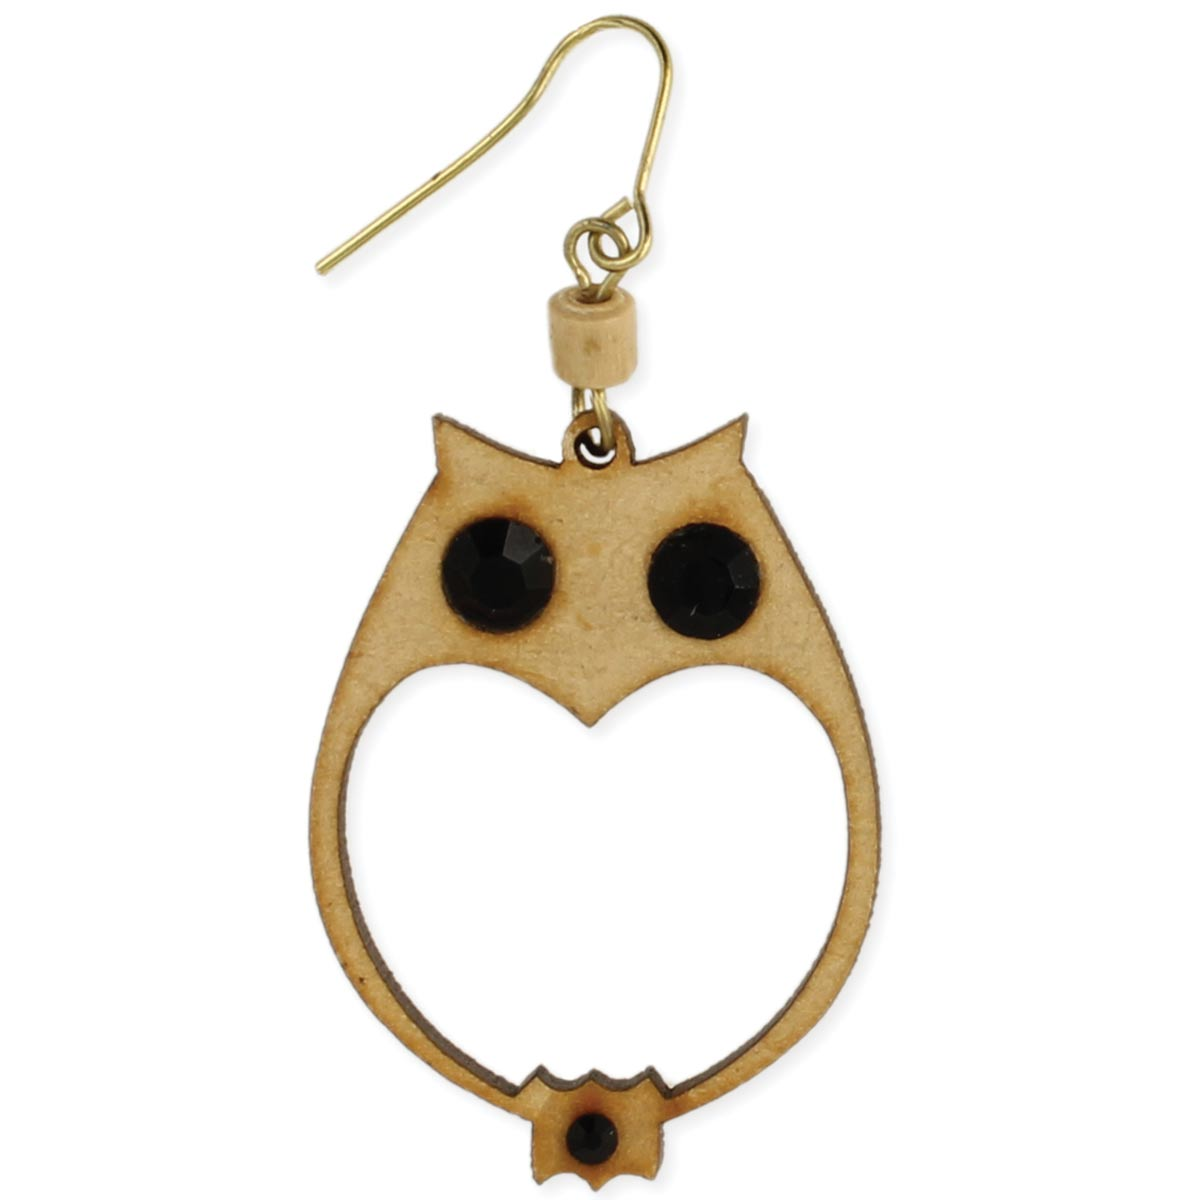 Cutout Wood Owl Earring